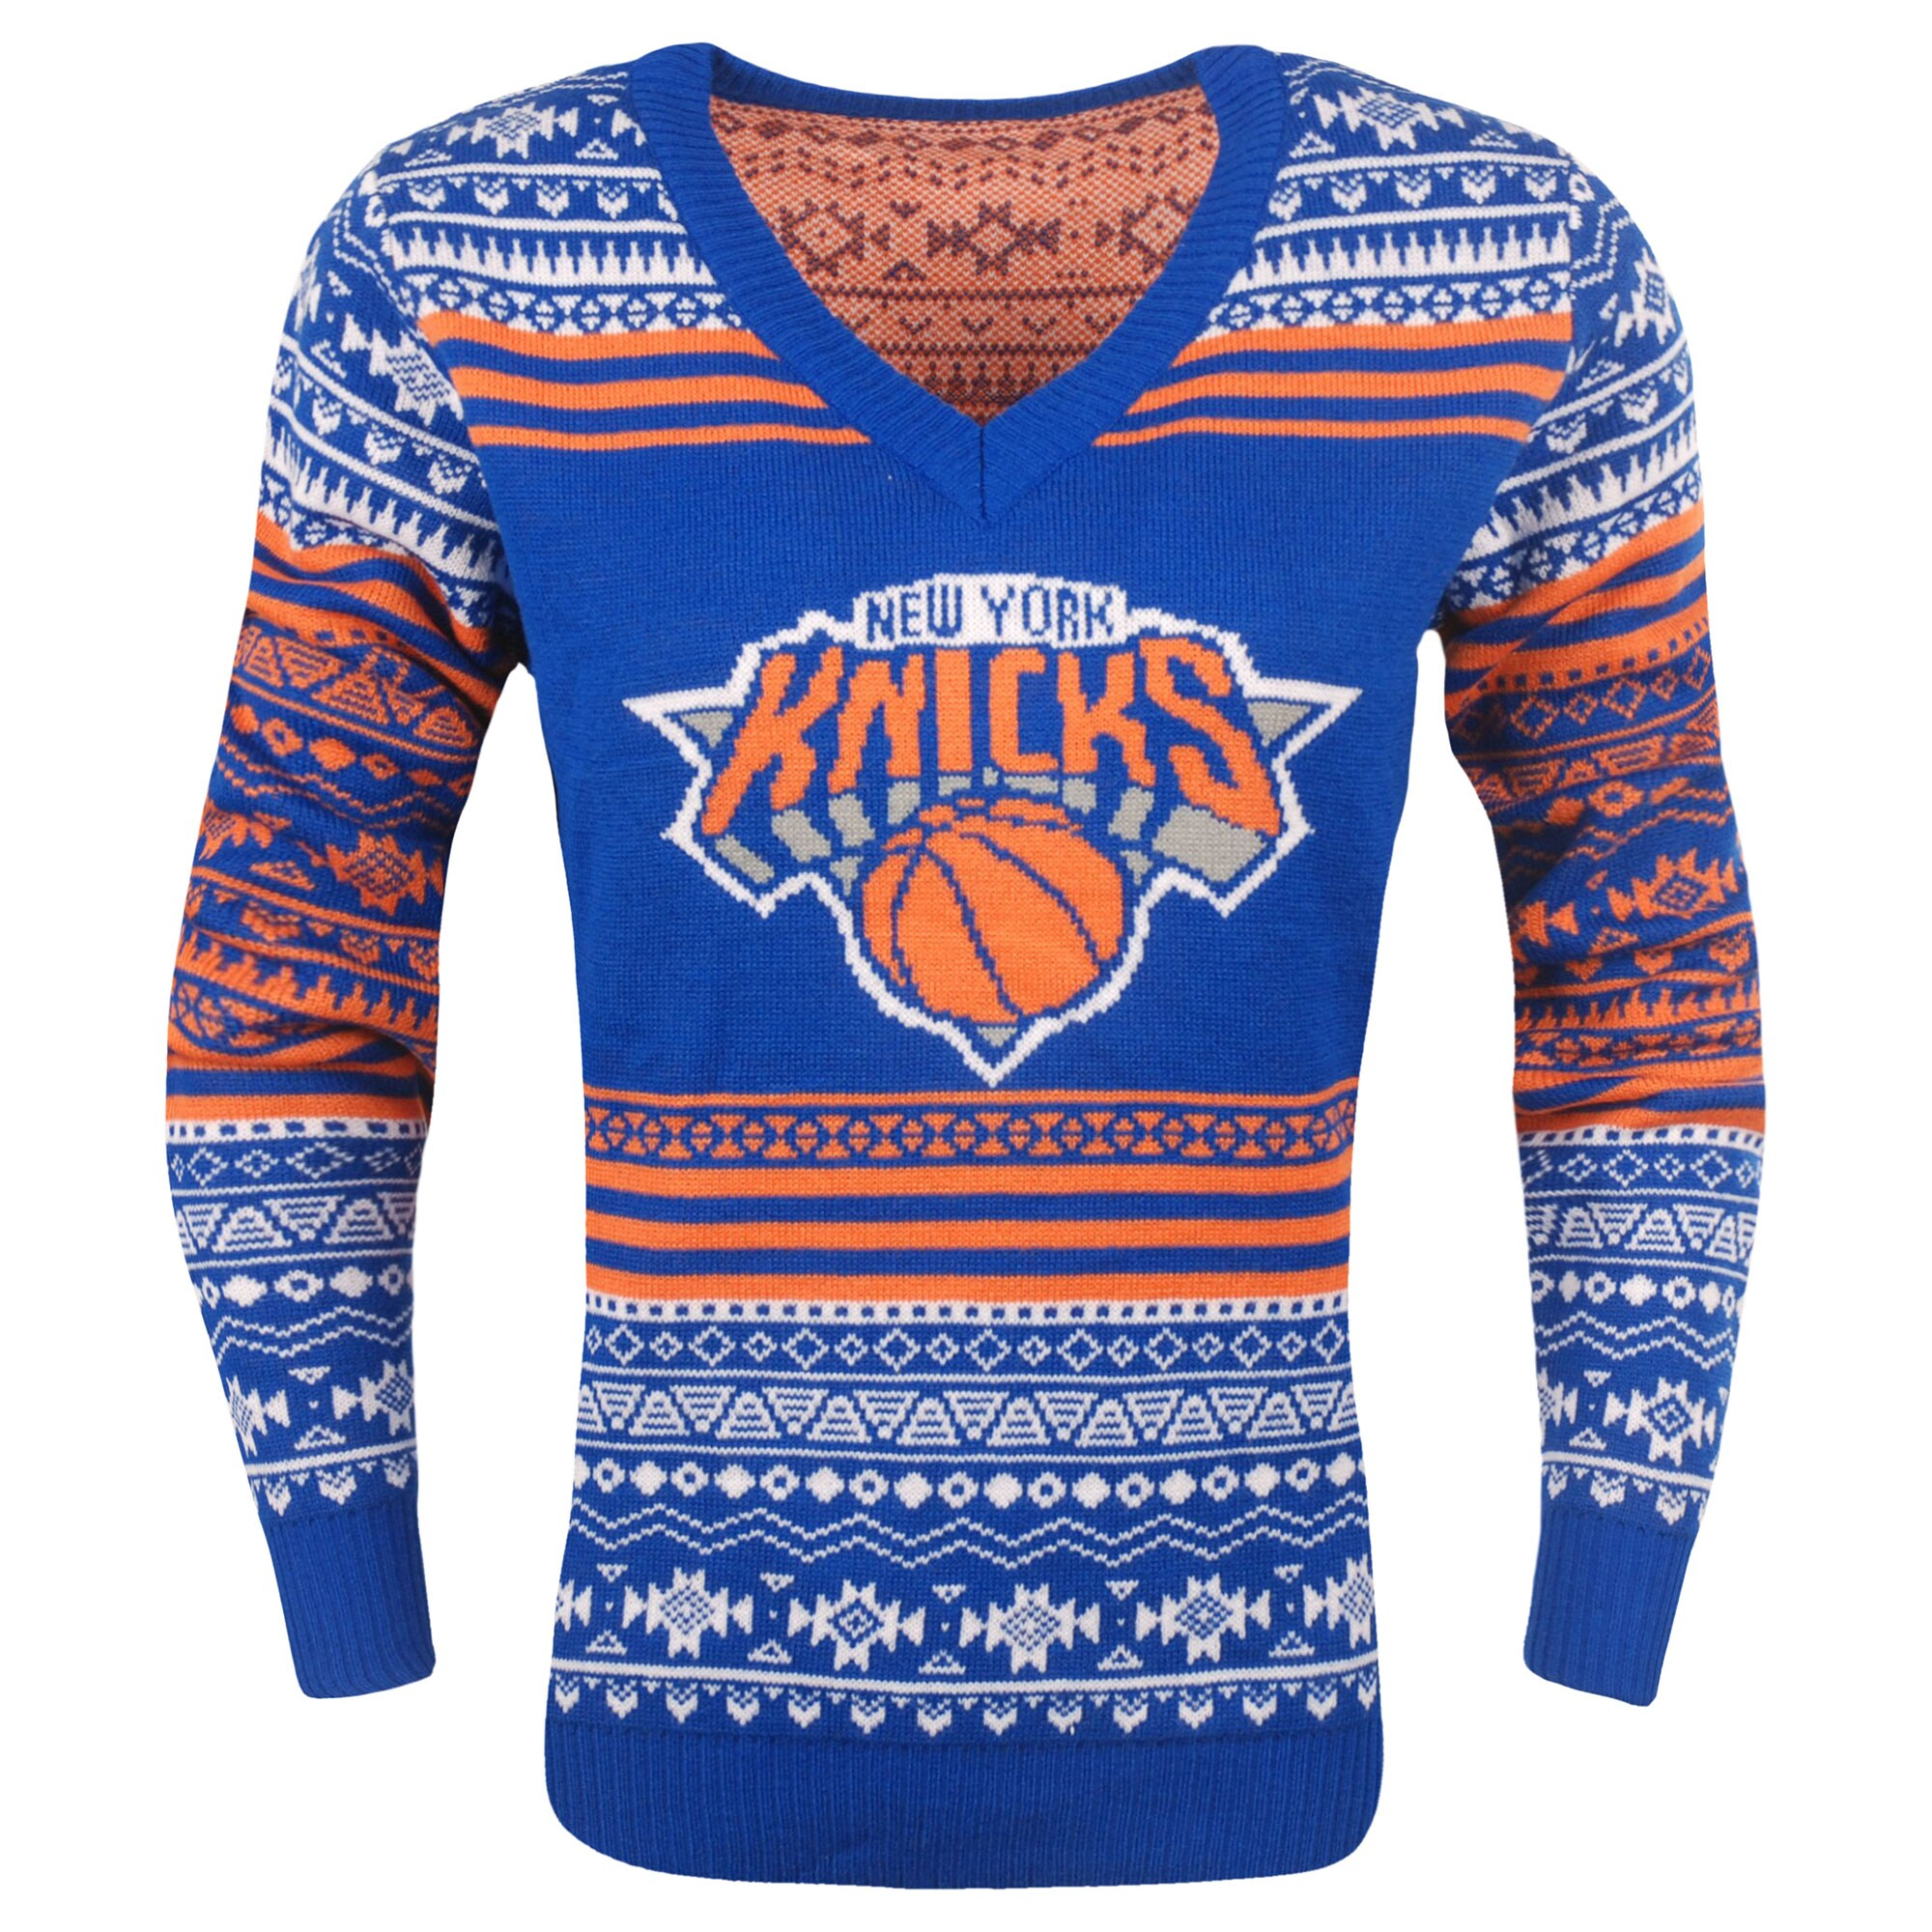 New York Knicks Women's Big Logo Aztec V-Neck Sweater - Blue